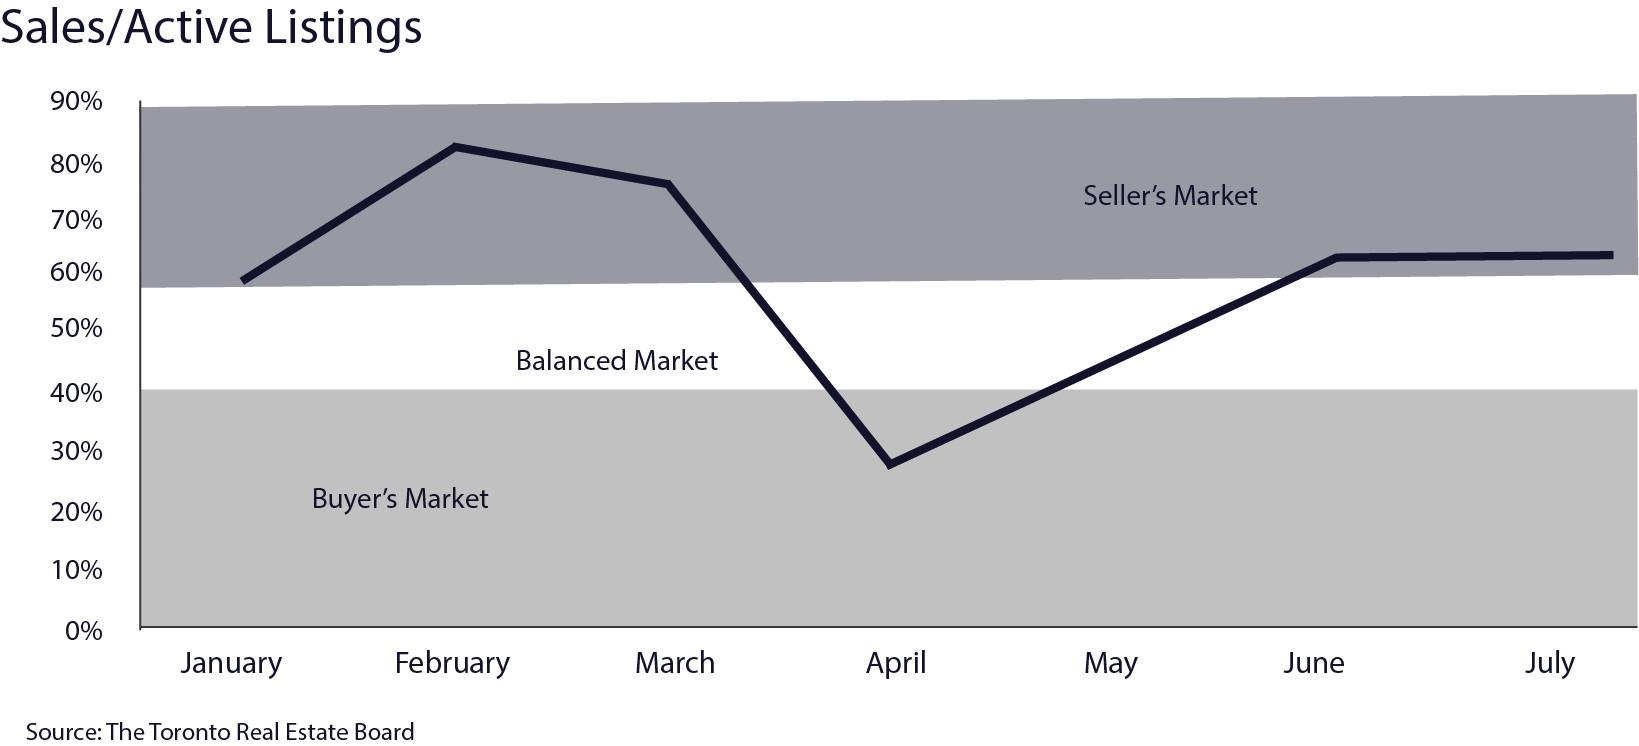 Is It A Buyer's or Seller's Market in Toronto?